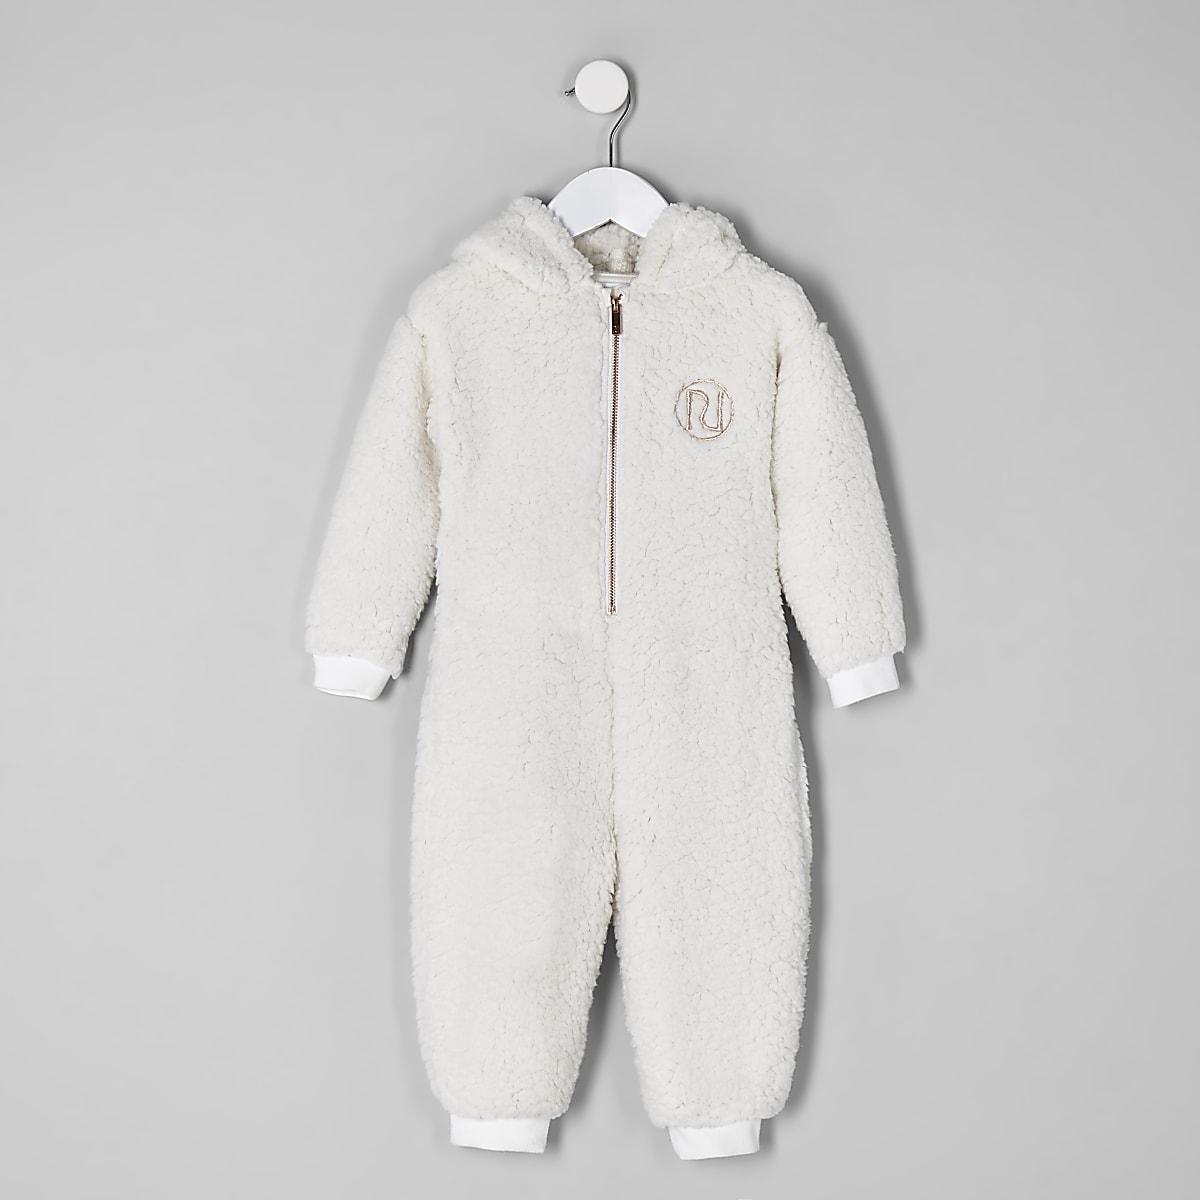 Mini - Crème onesie met borg en 'Amour'-print voor meisjes